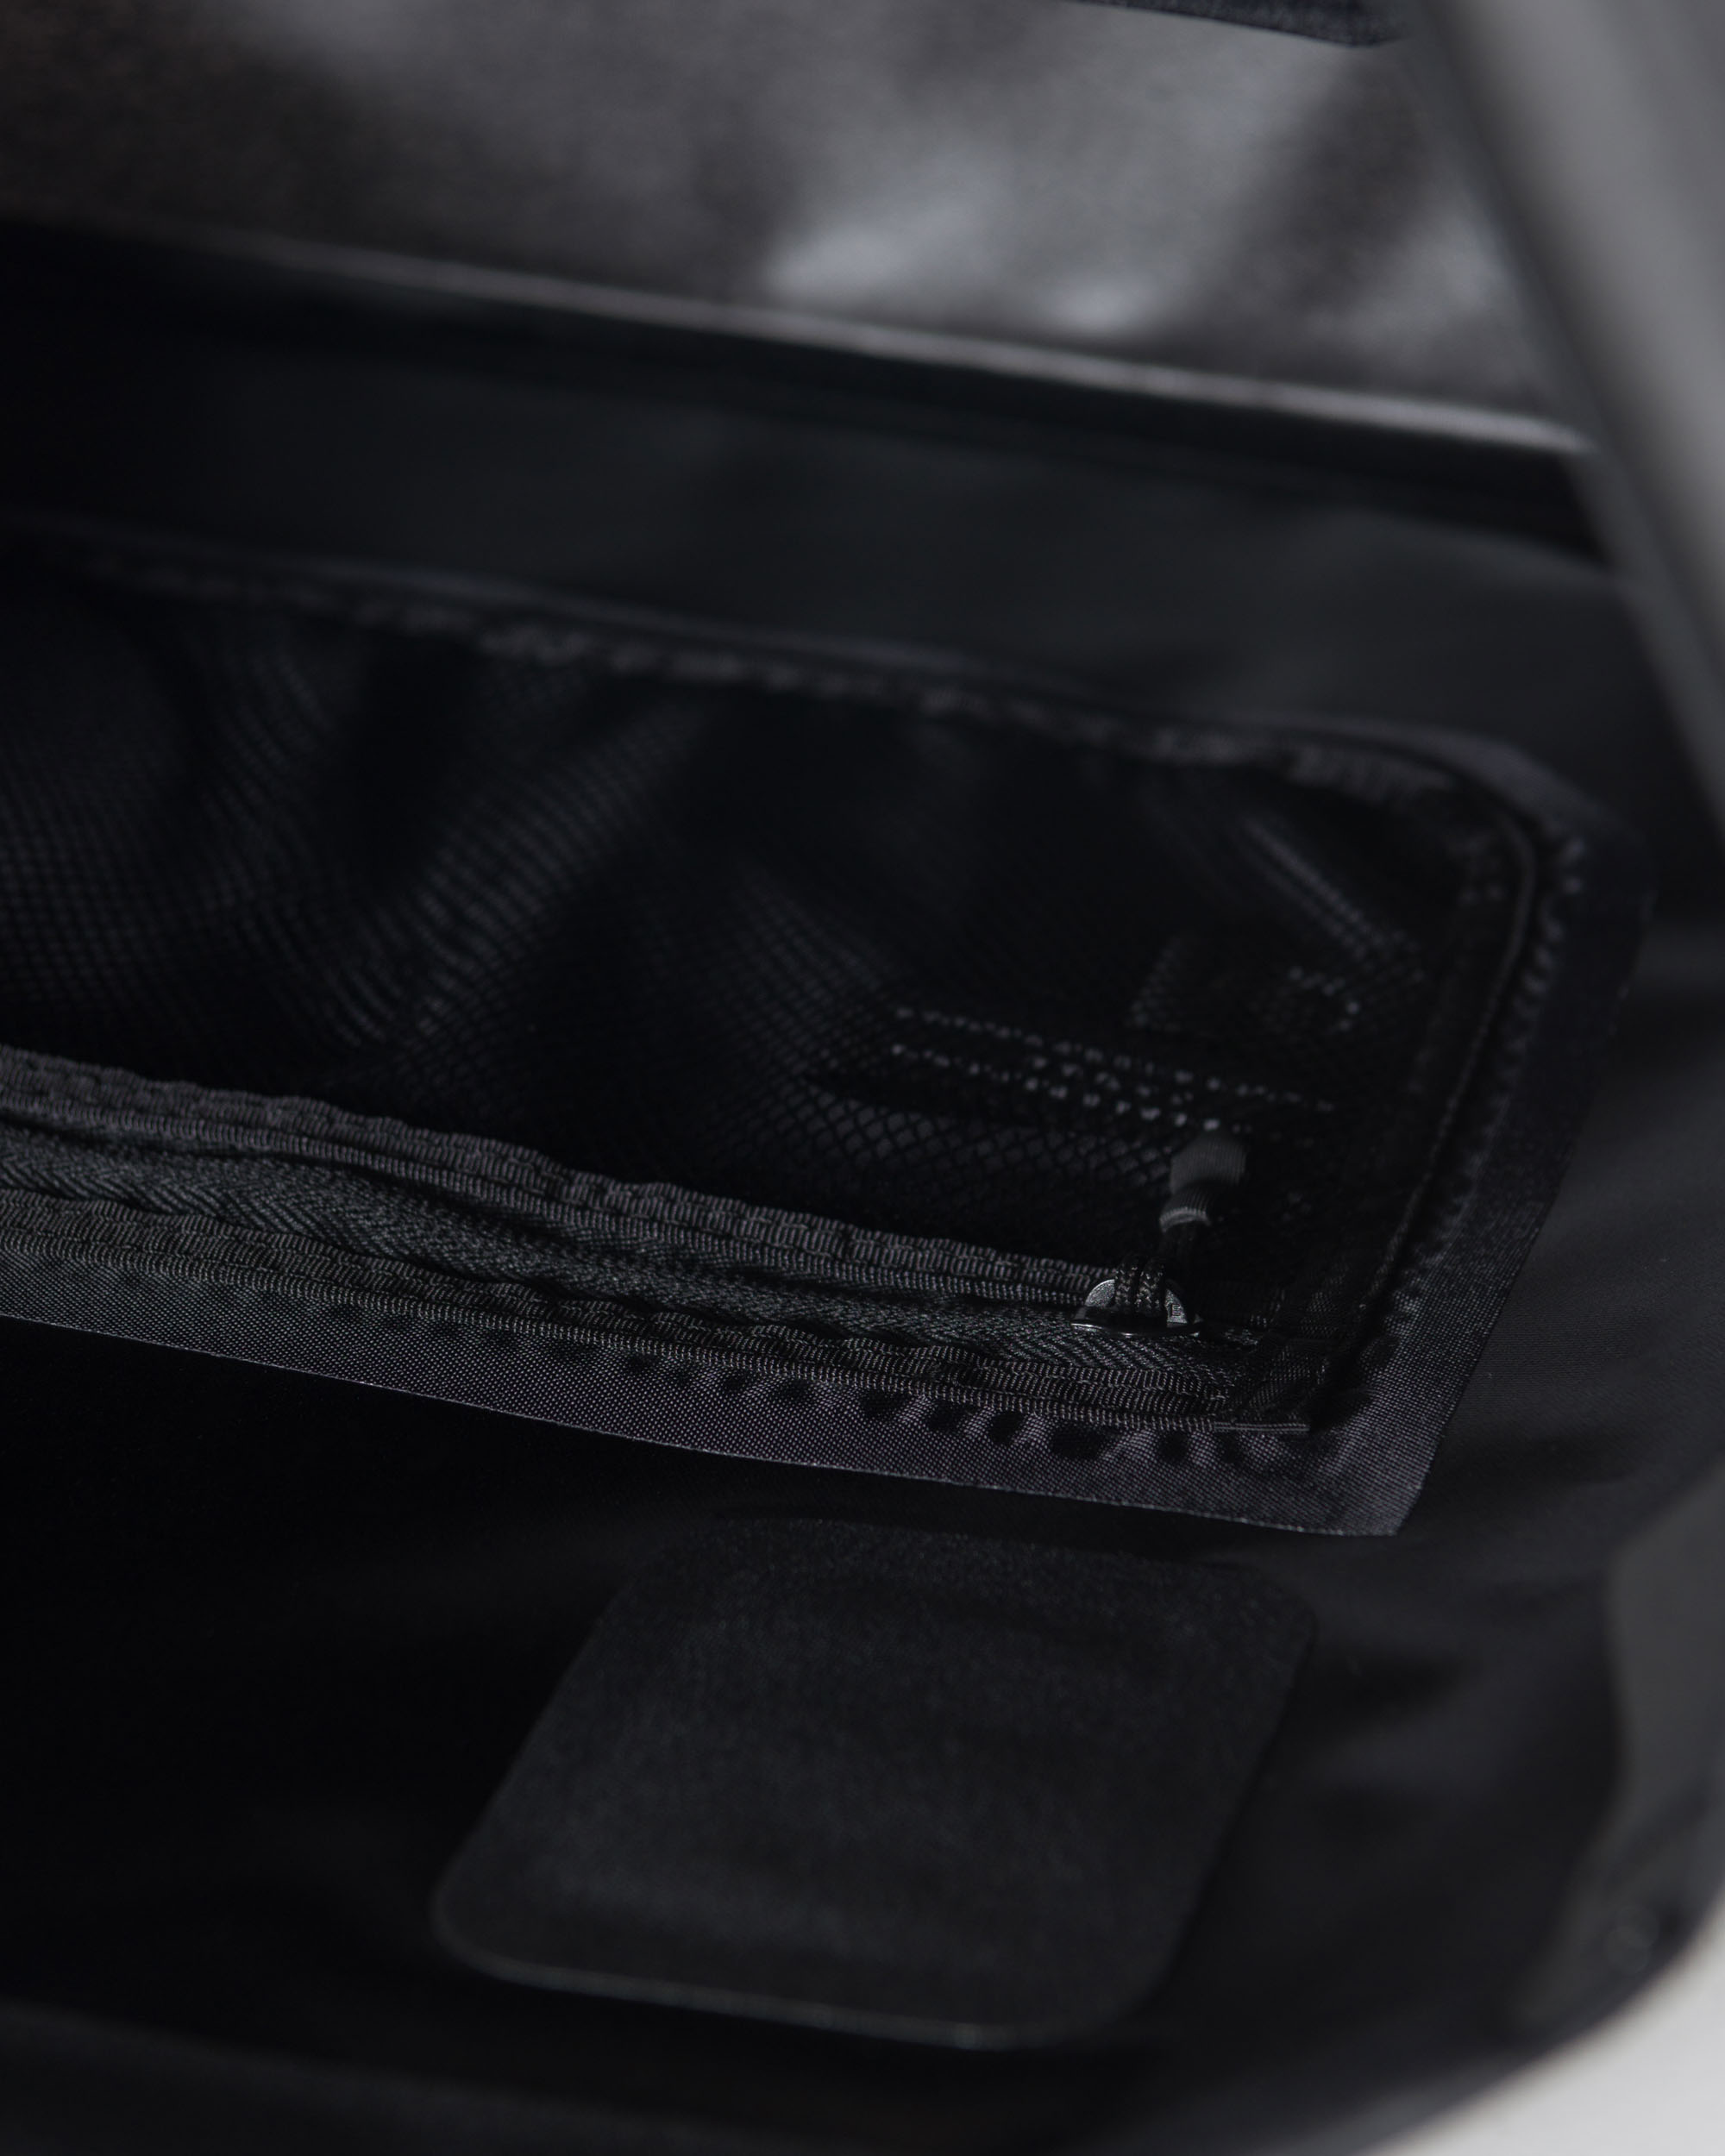 ... Herschel Supply Studio branding  Interior zippered mesh sleeve and die- cut key loop e97a47516b3c2